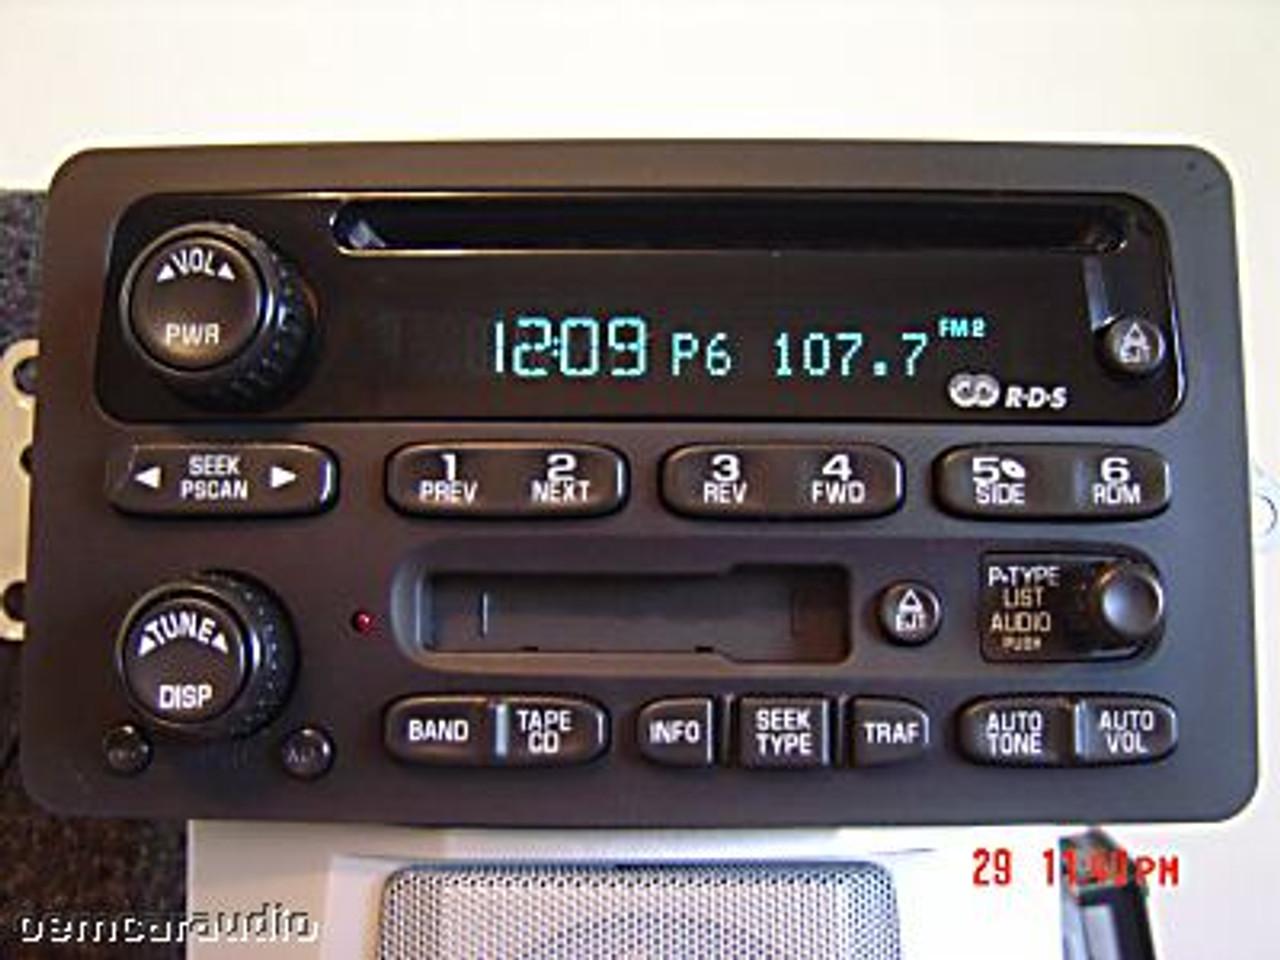 gm radio cal err cub cadet belt replacement diagram repair 2003 2004 2005 2006 chevy gmc cadillac cd 03 06 envoy yukon sierra player